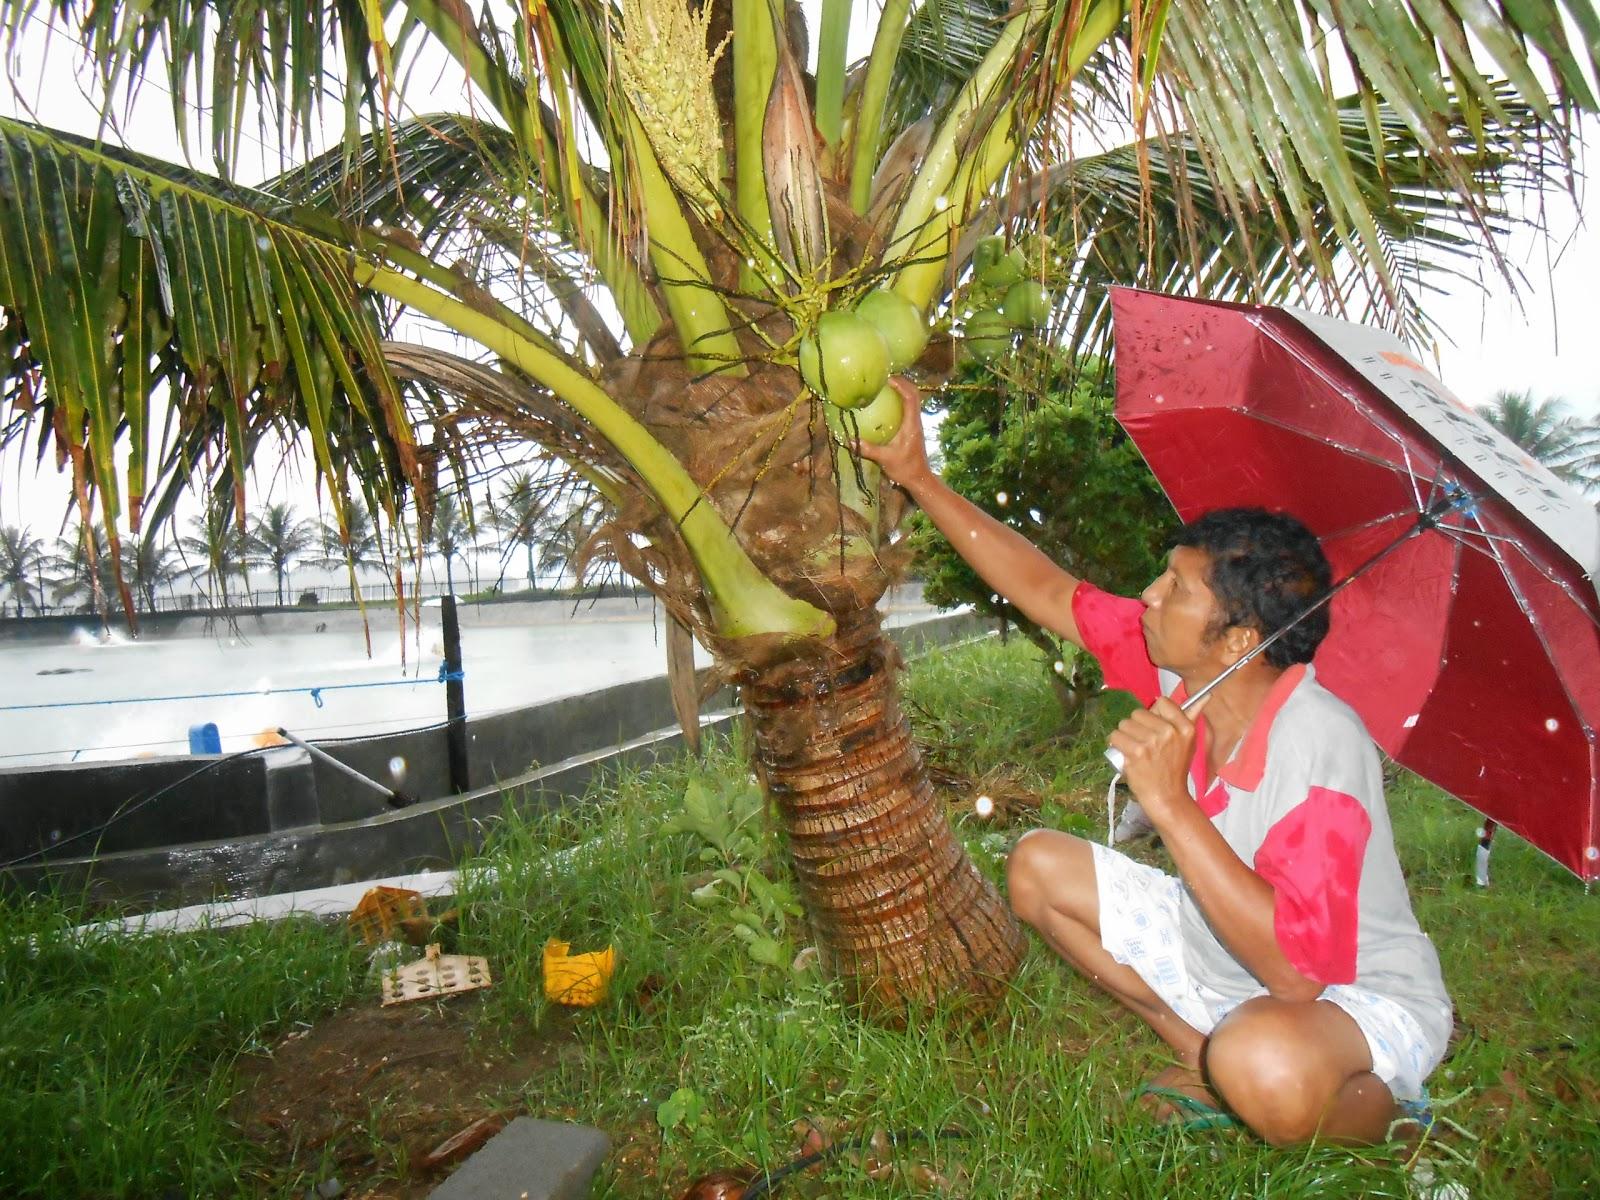 Bibit Tanaman Buah Langka Unggul Daerah Kota Blitar Jenis